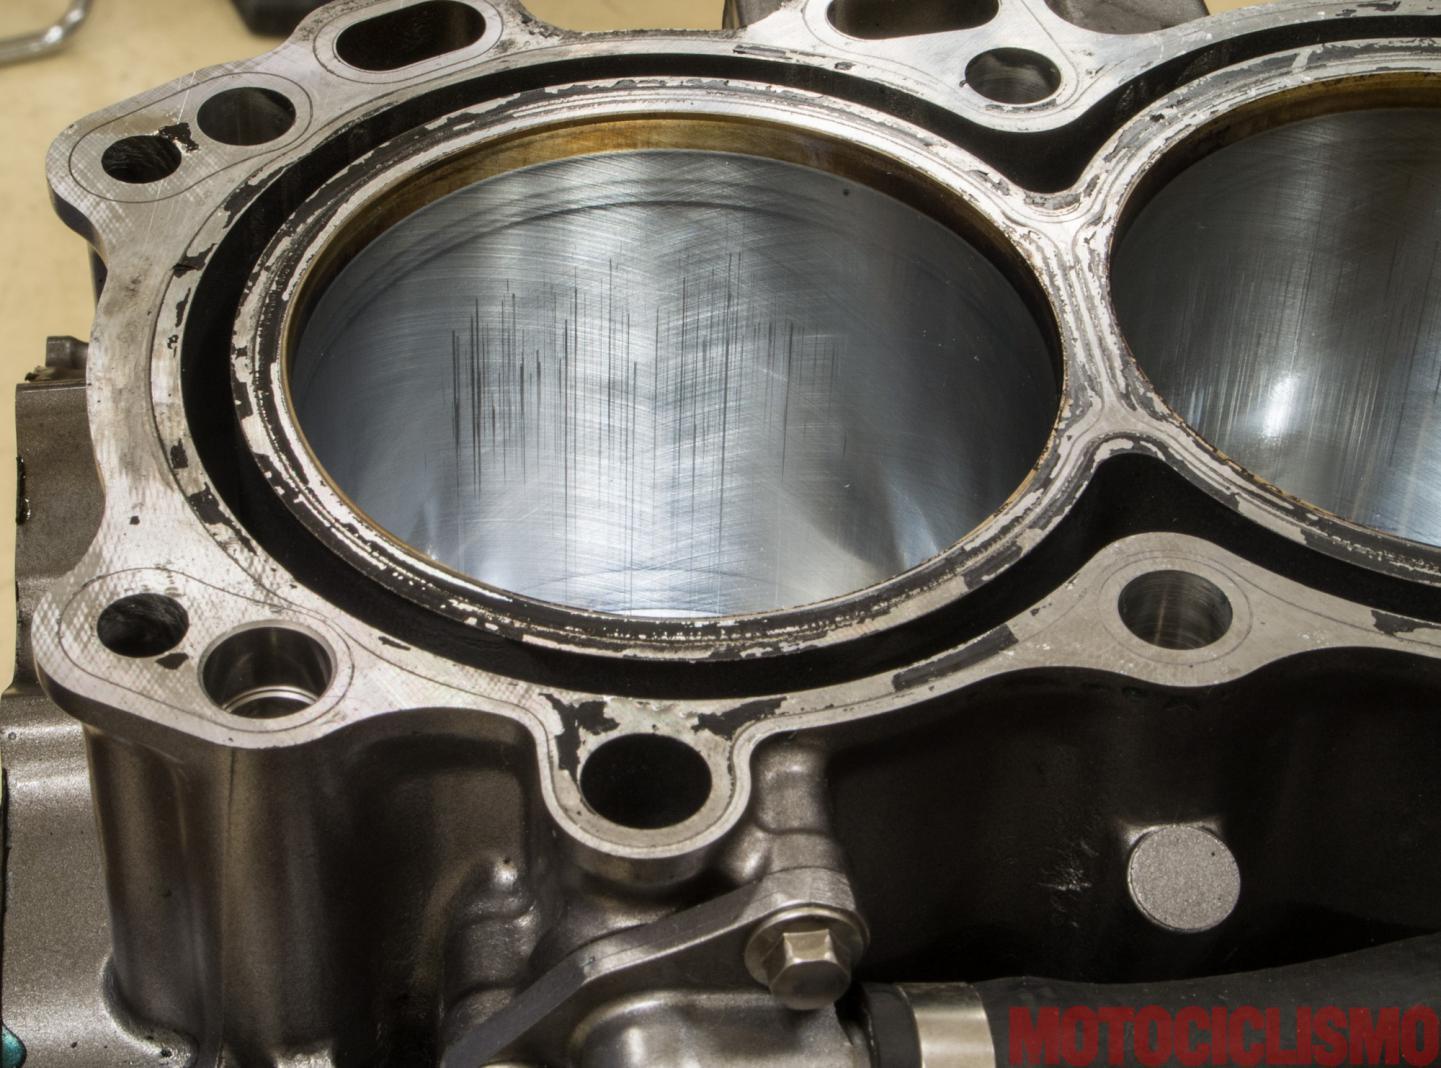 111882d1491433528-new-crf1000l-50-000km-test-honda-africa-twin-long-test-motociclismo-smontaggio-motore-usura-cilindri.jpg